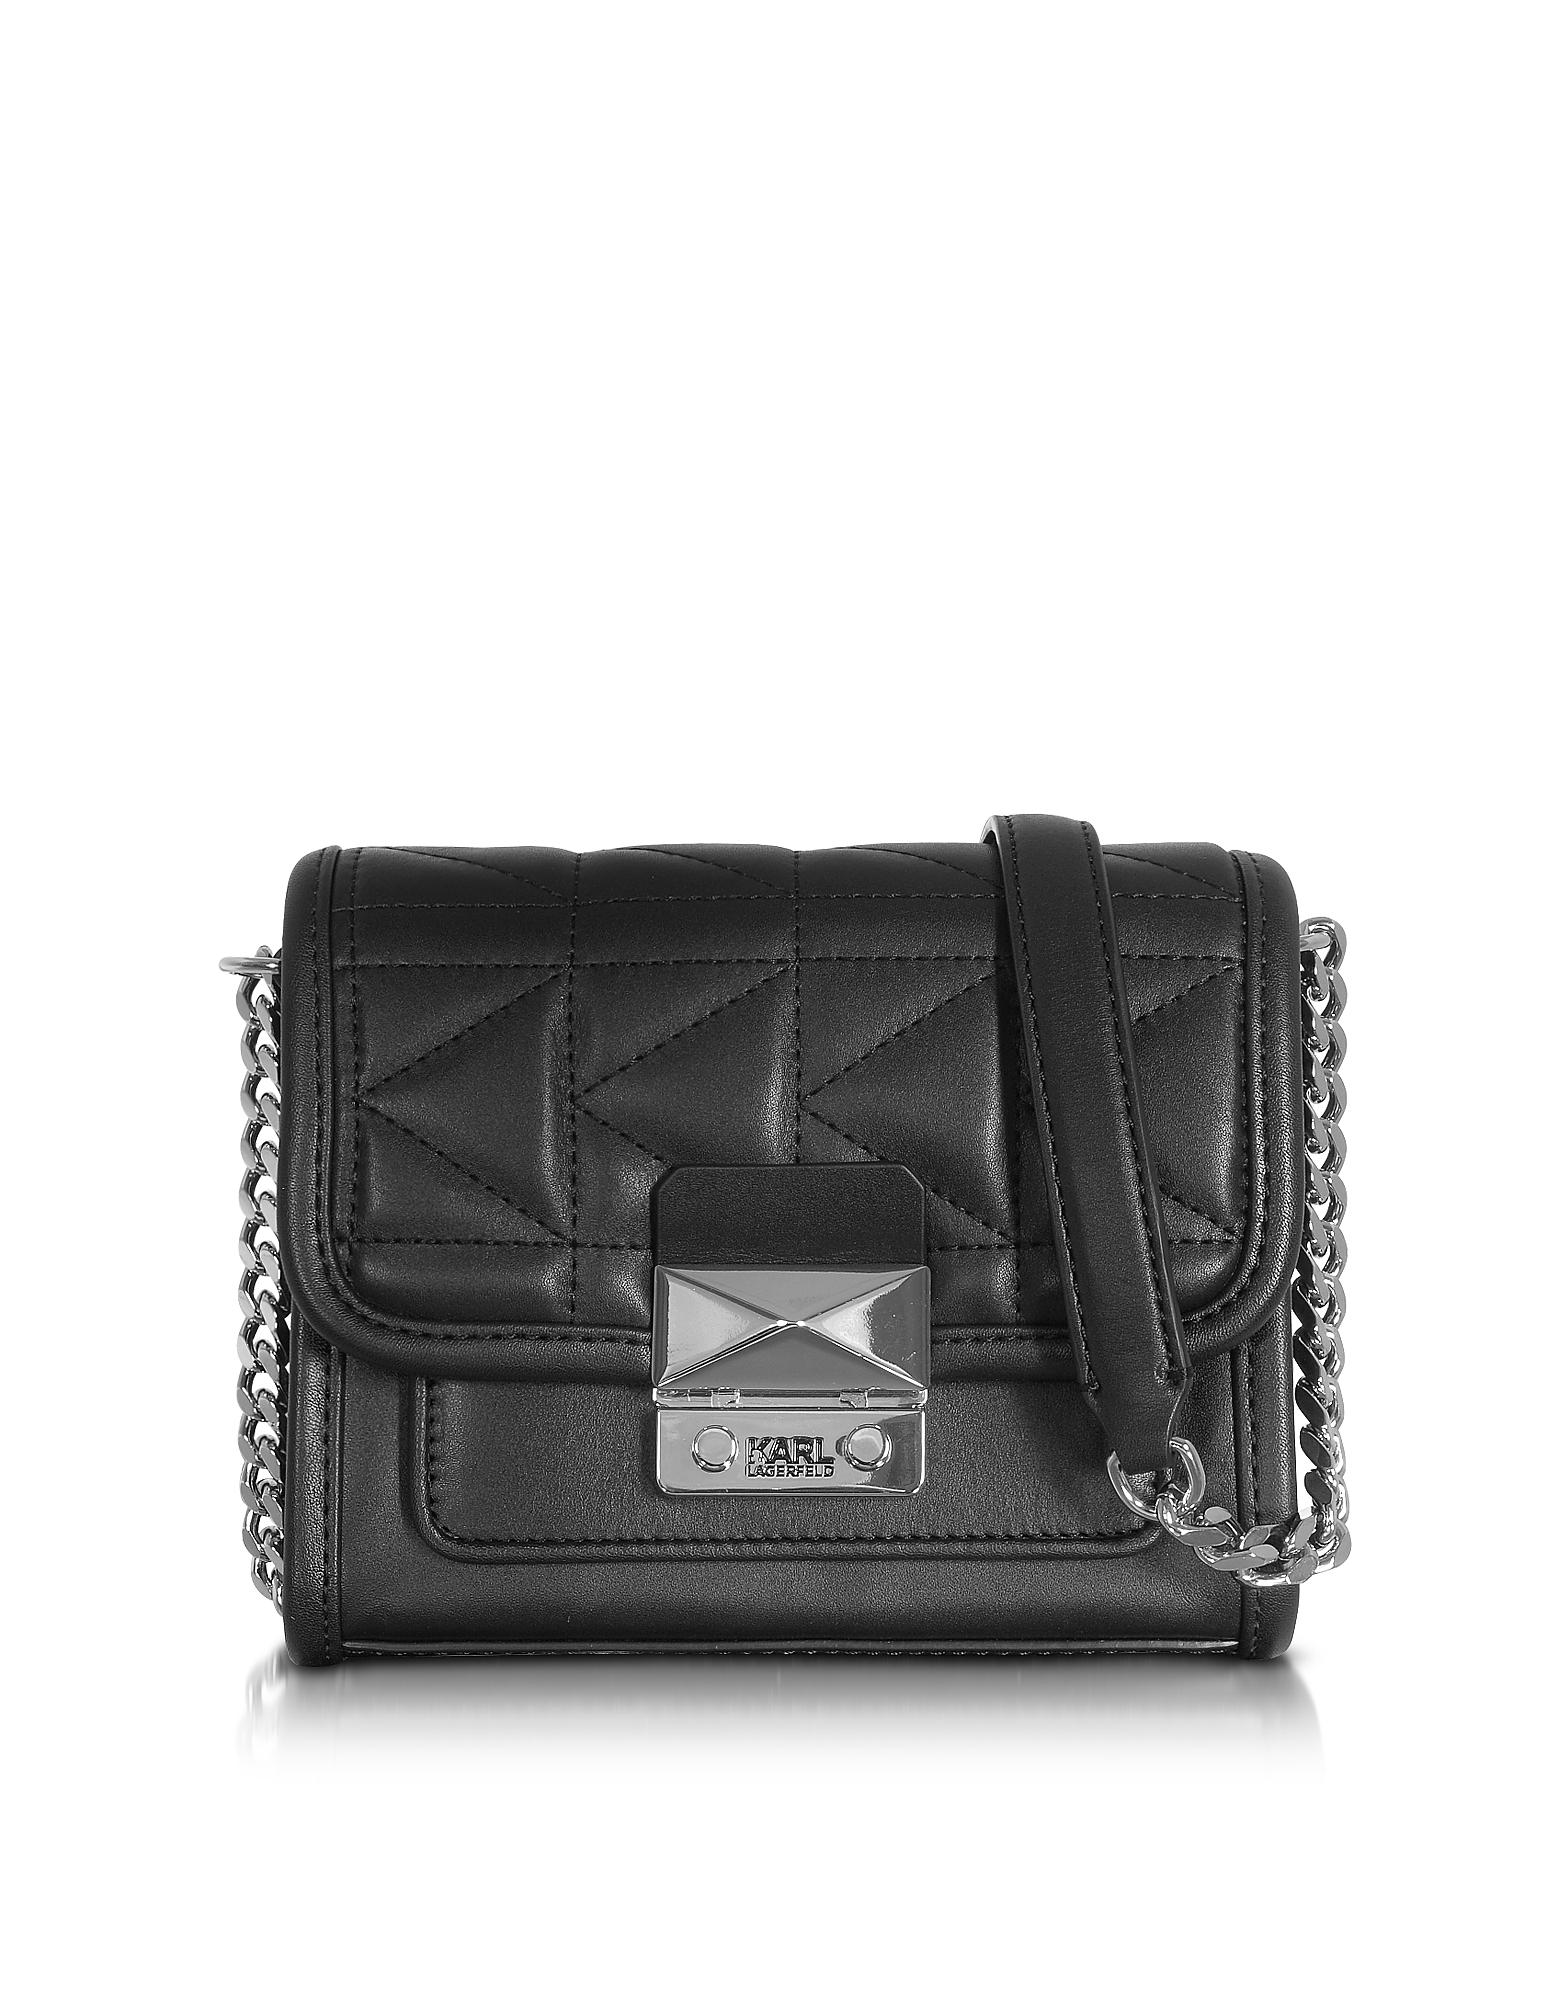 Karl Lagerfeld Handbags, K/Kuilted Black Leather Mini Crossbody Bag